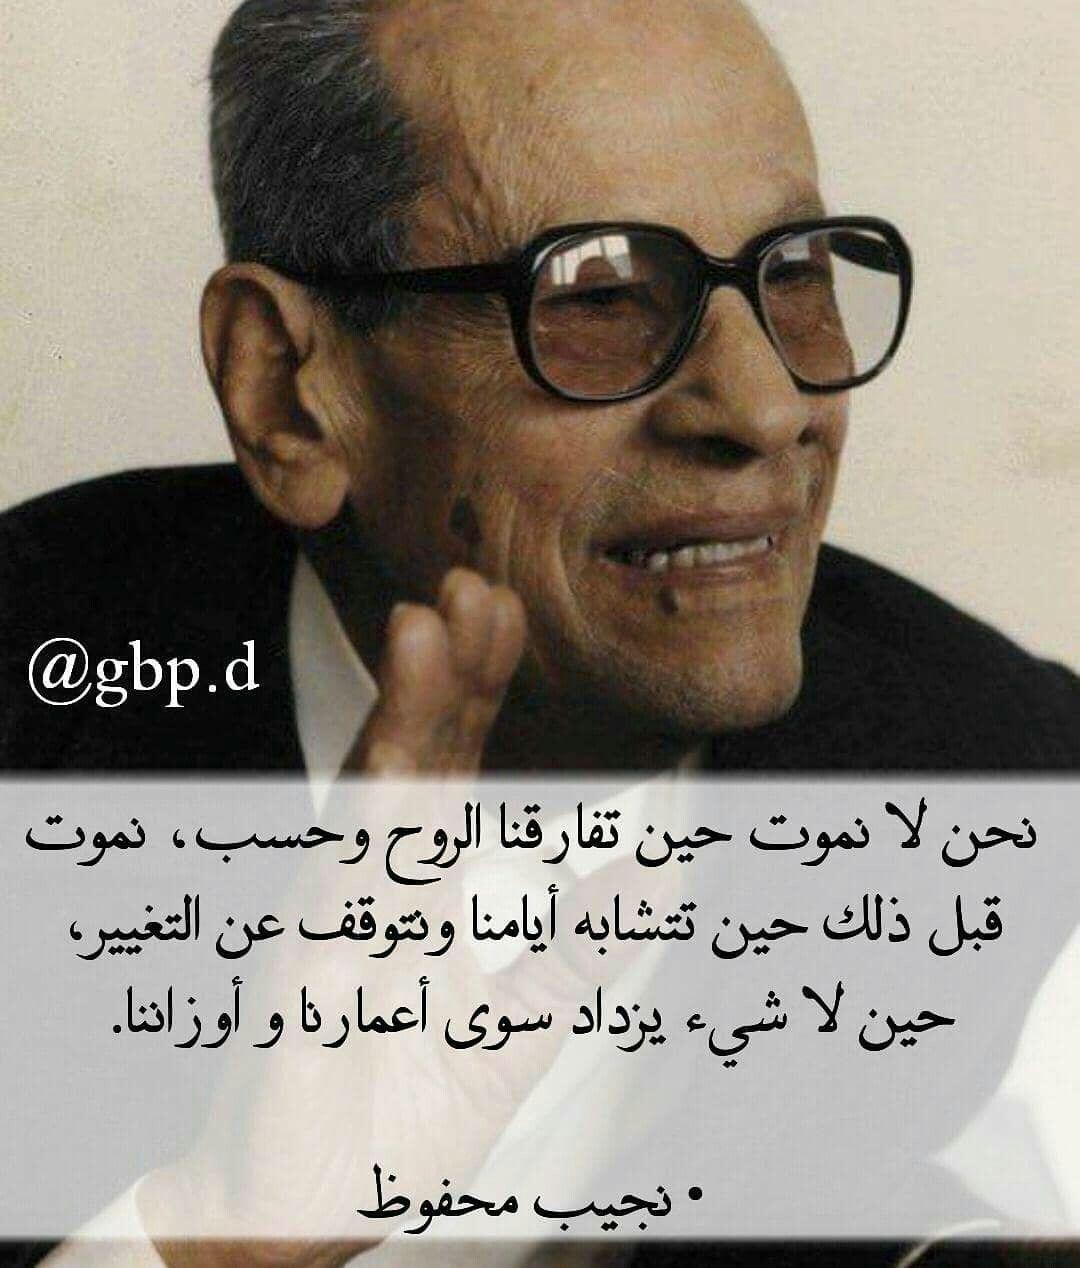 نجيب محفوظ Thoughts Quotes Quotes Arabic Quotes